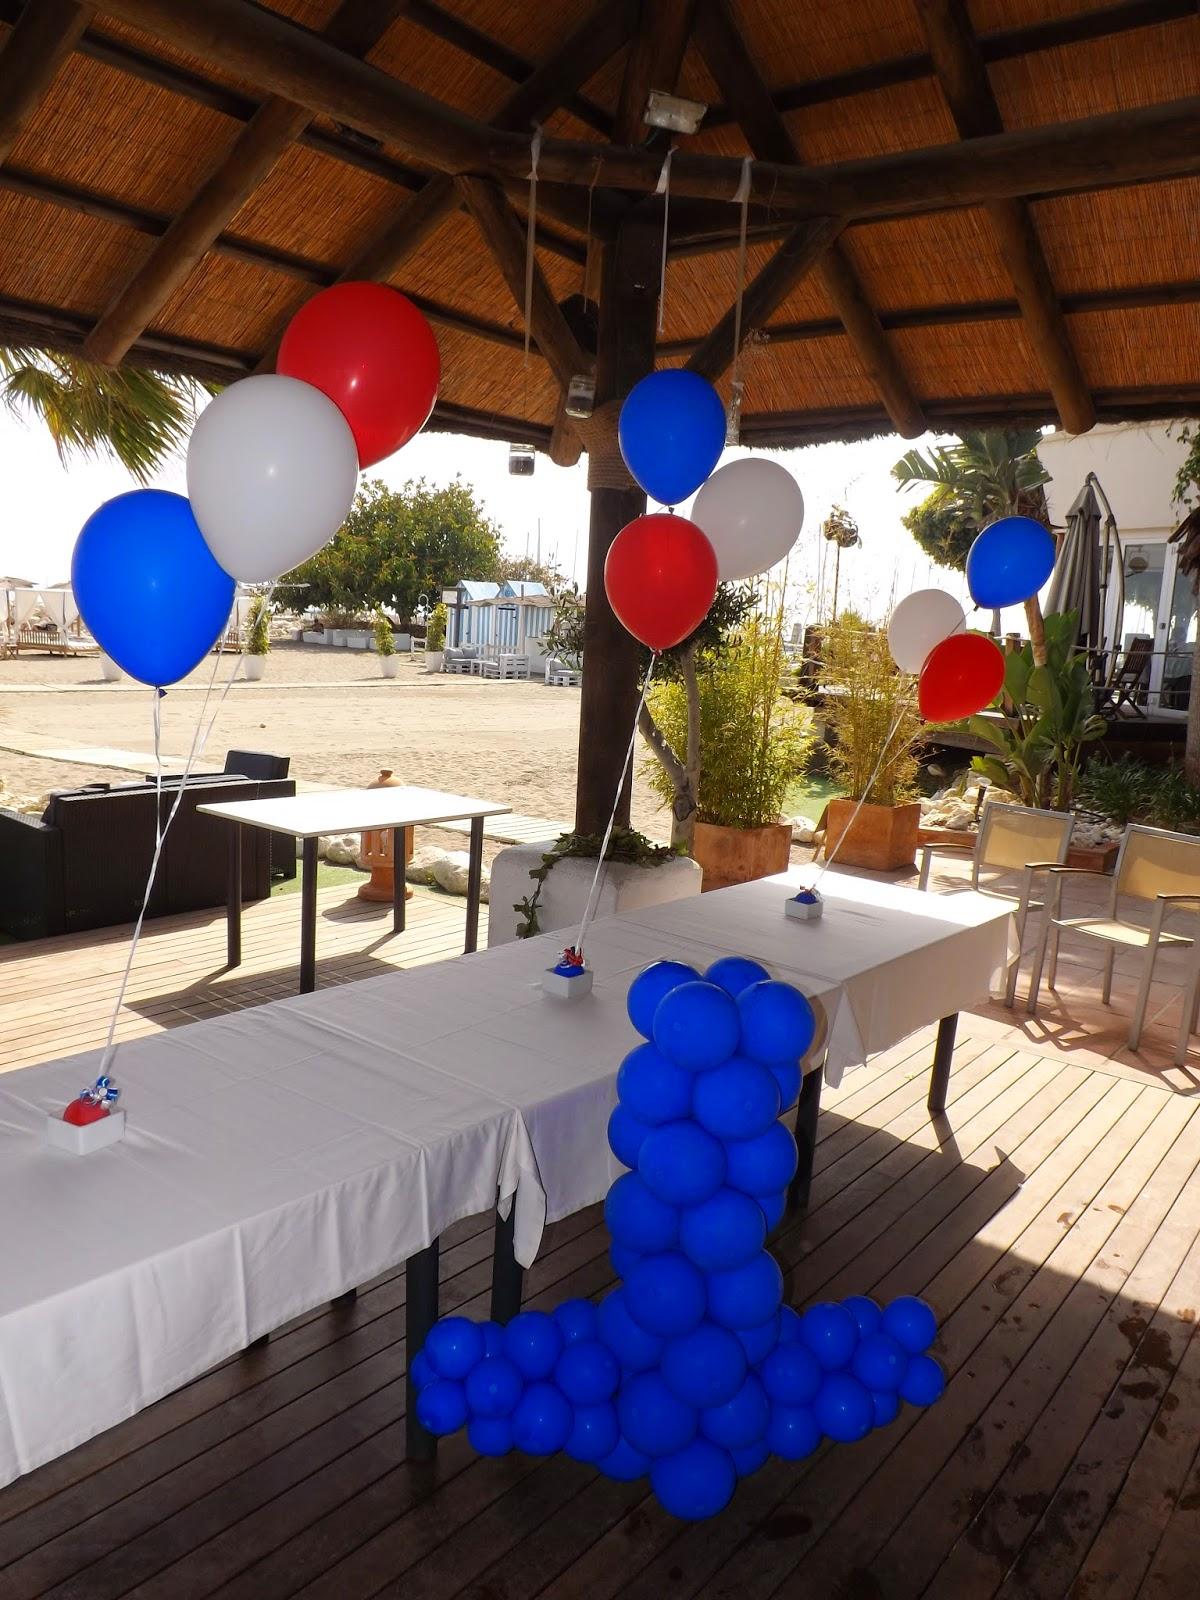 Decoraciones d 39 globos fiesta marinera d 39 globos - Fiesta marinera decoracion ...